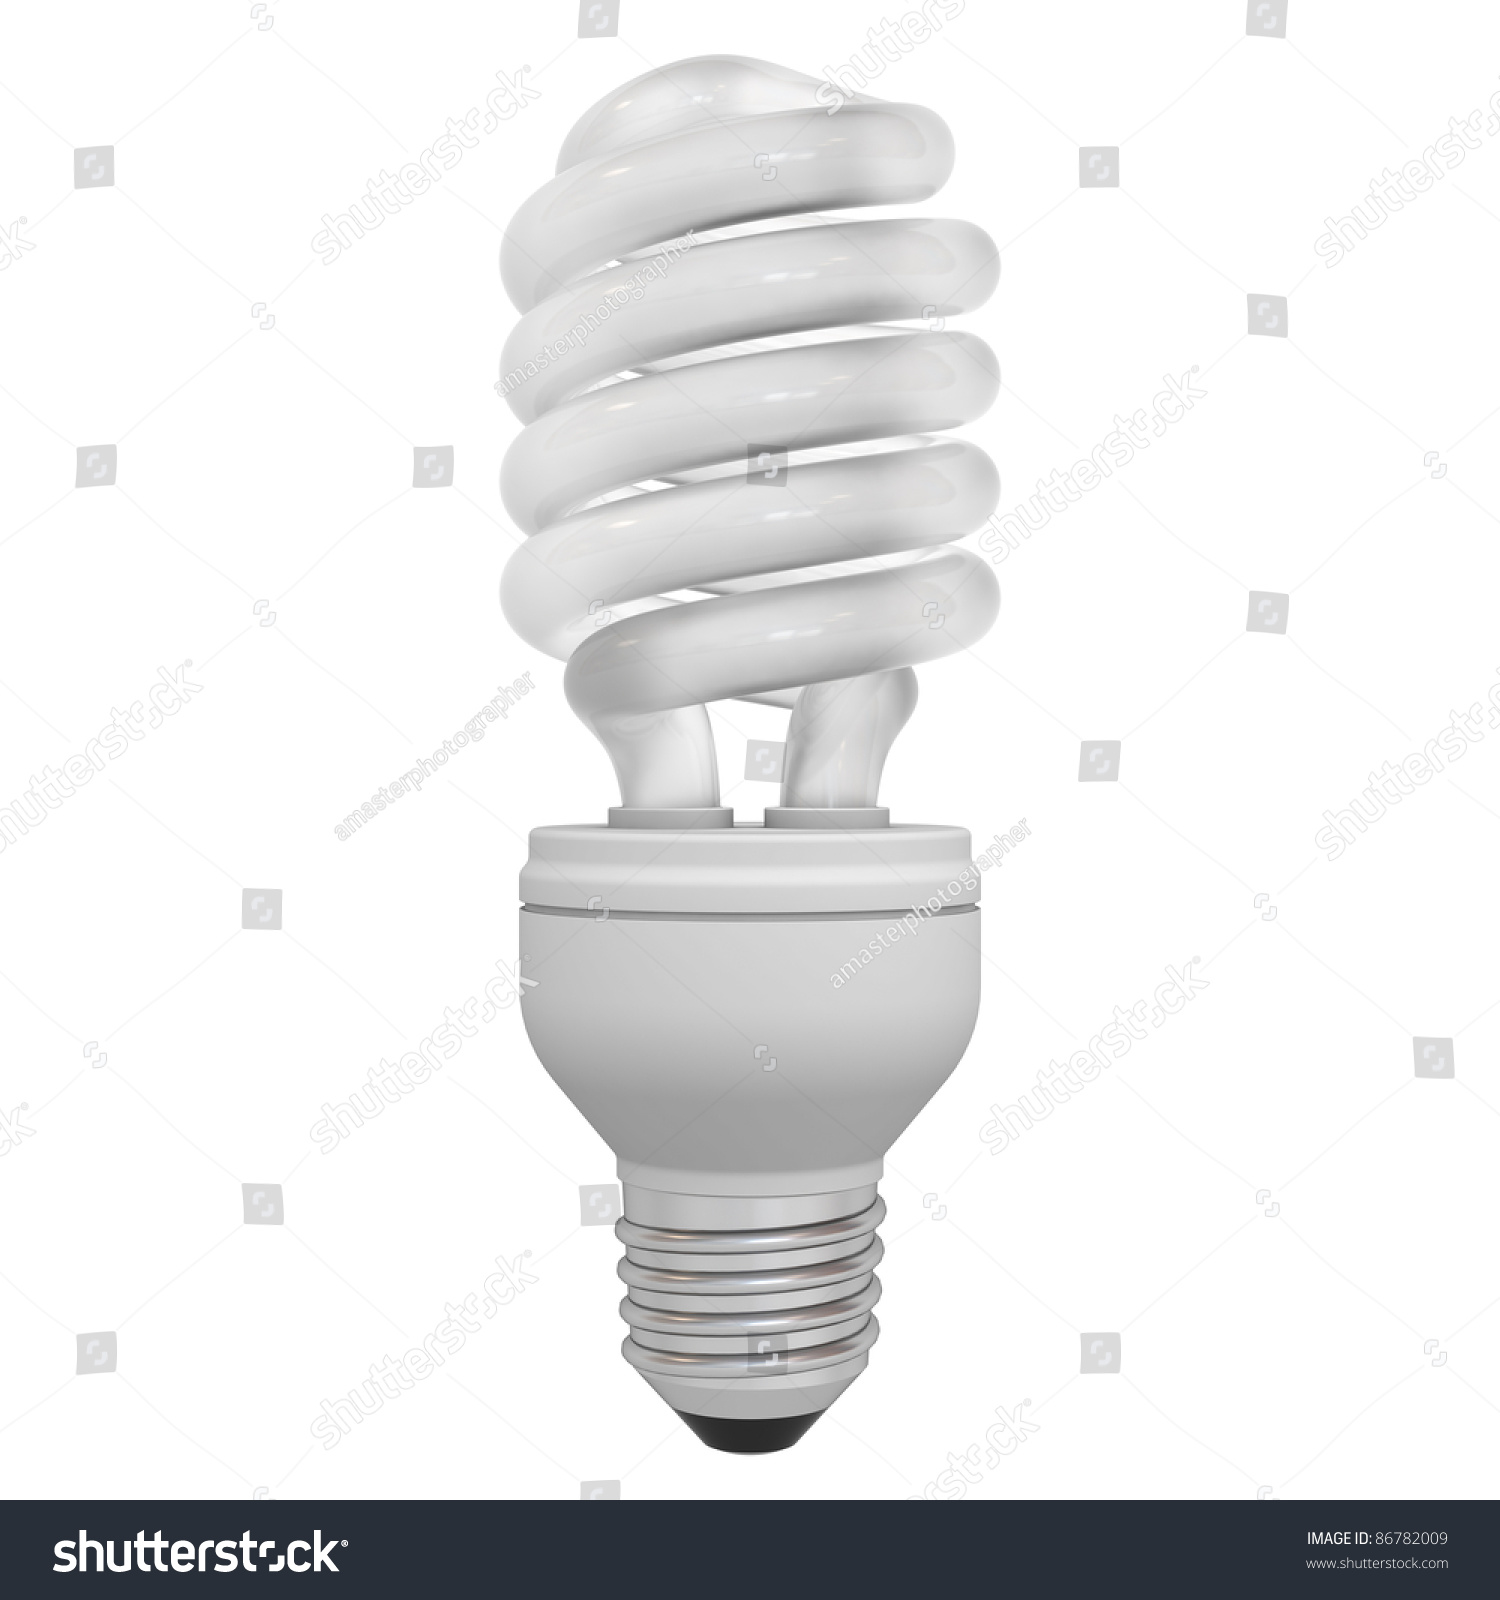 Energy Saving pact Fluorescent Light Bulb Stock Illustration